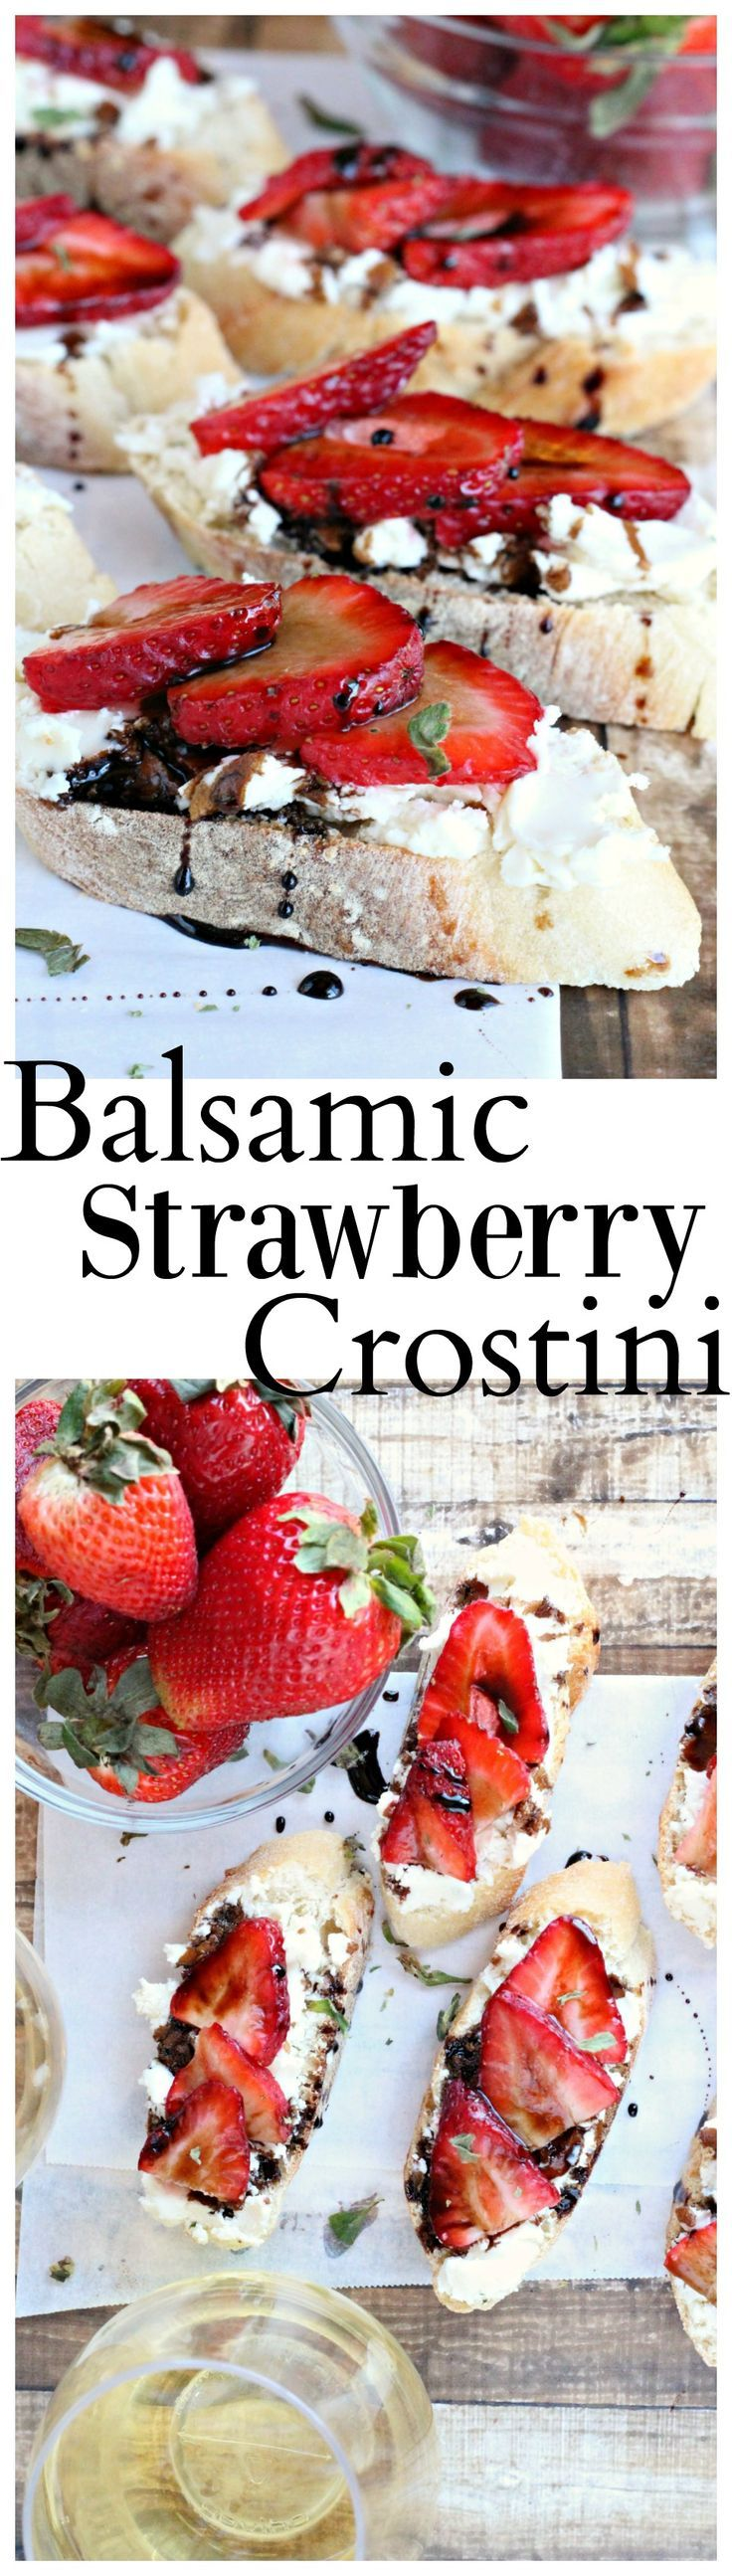 Balsamic Strawberry Goat Cheese Crostini Life A Little Brighter Goat Cheese Crostini Food Wine Recipes